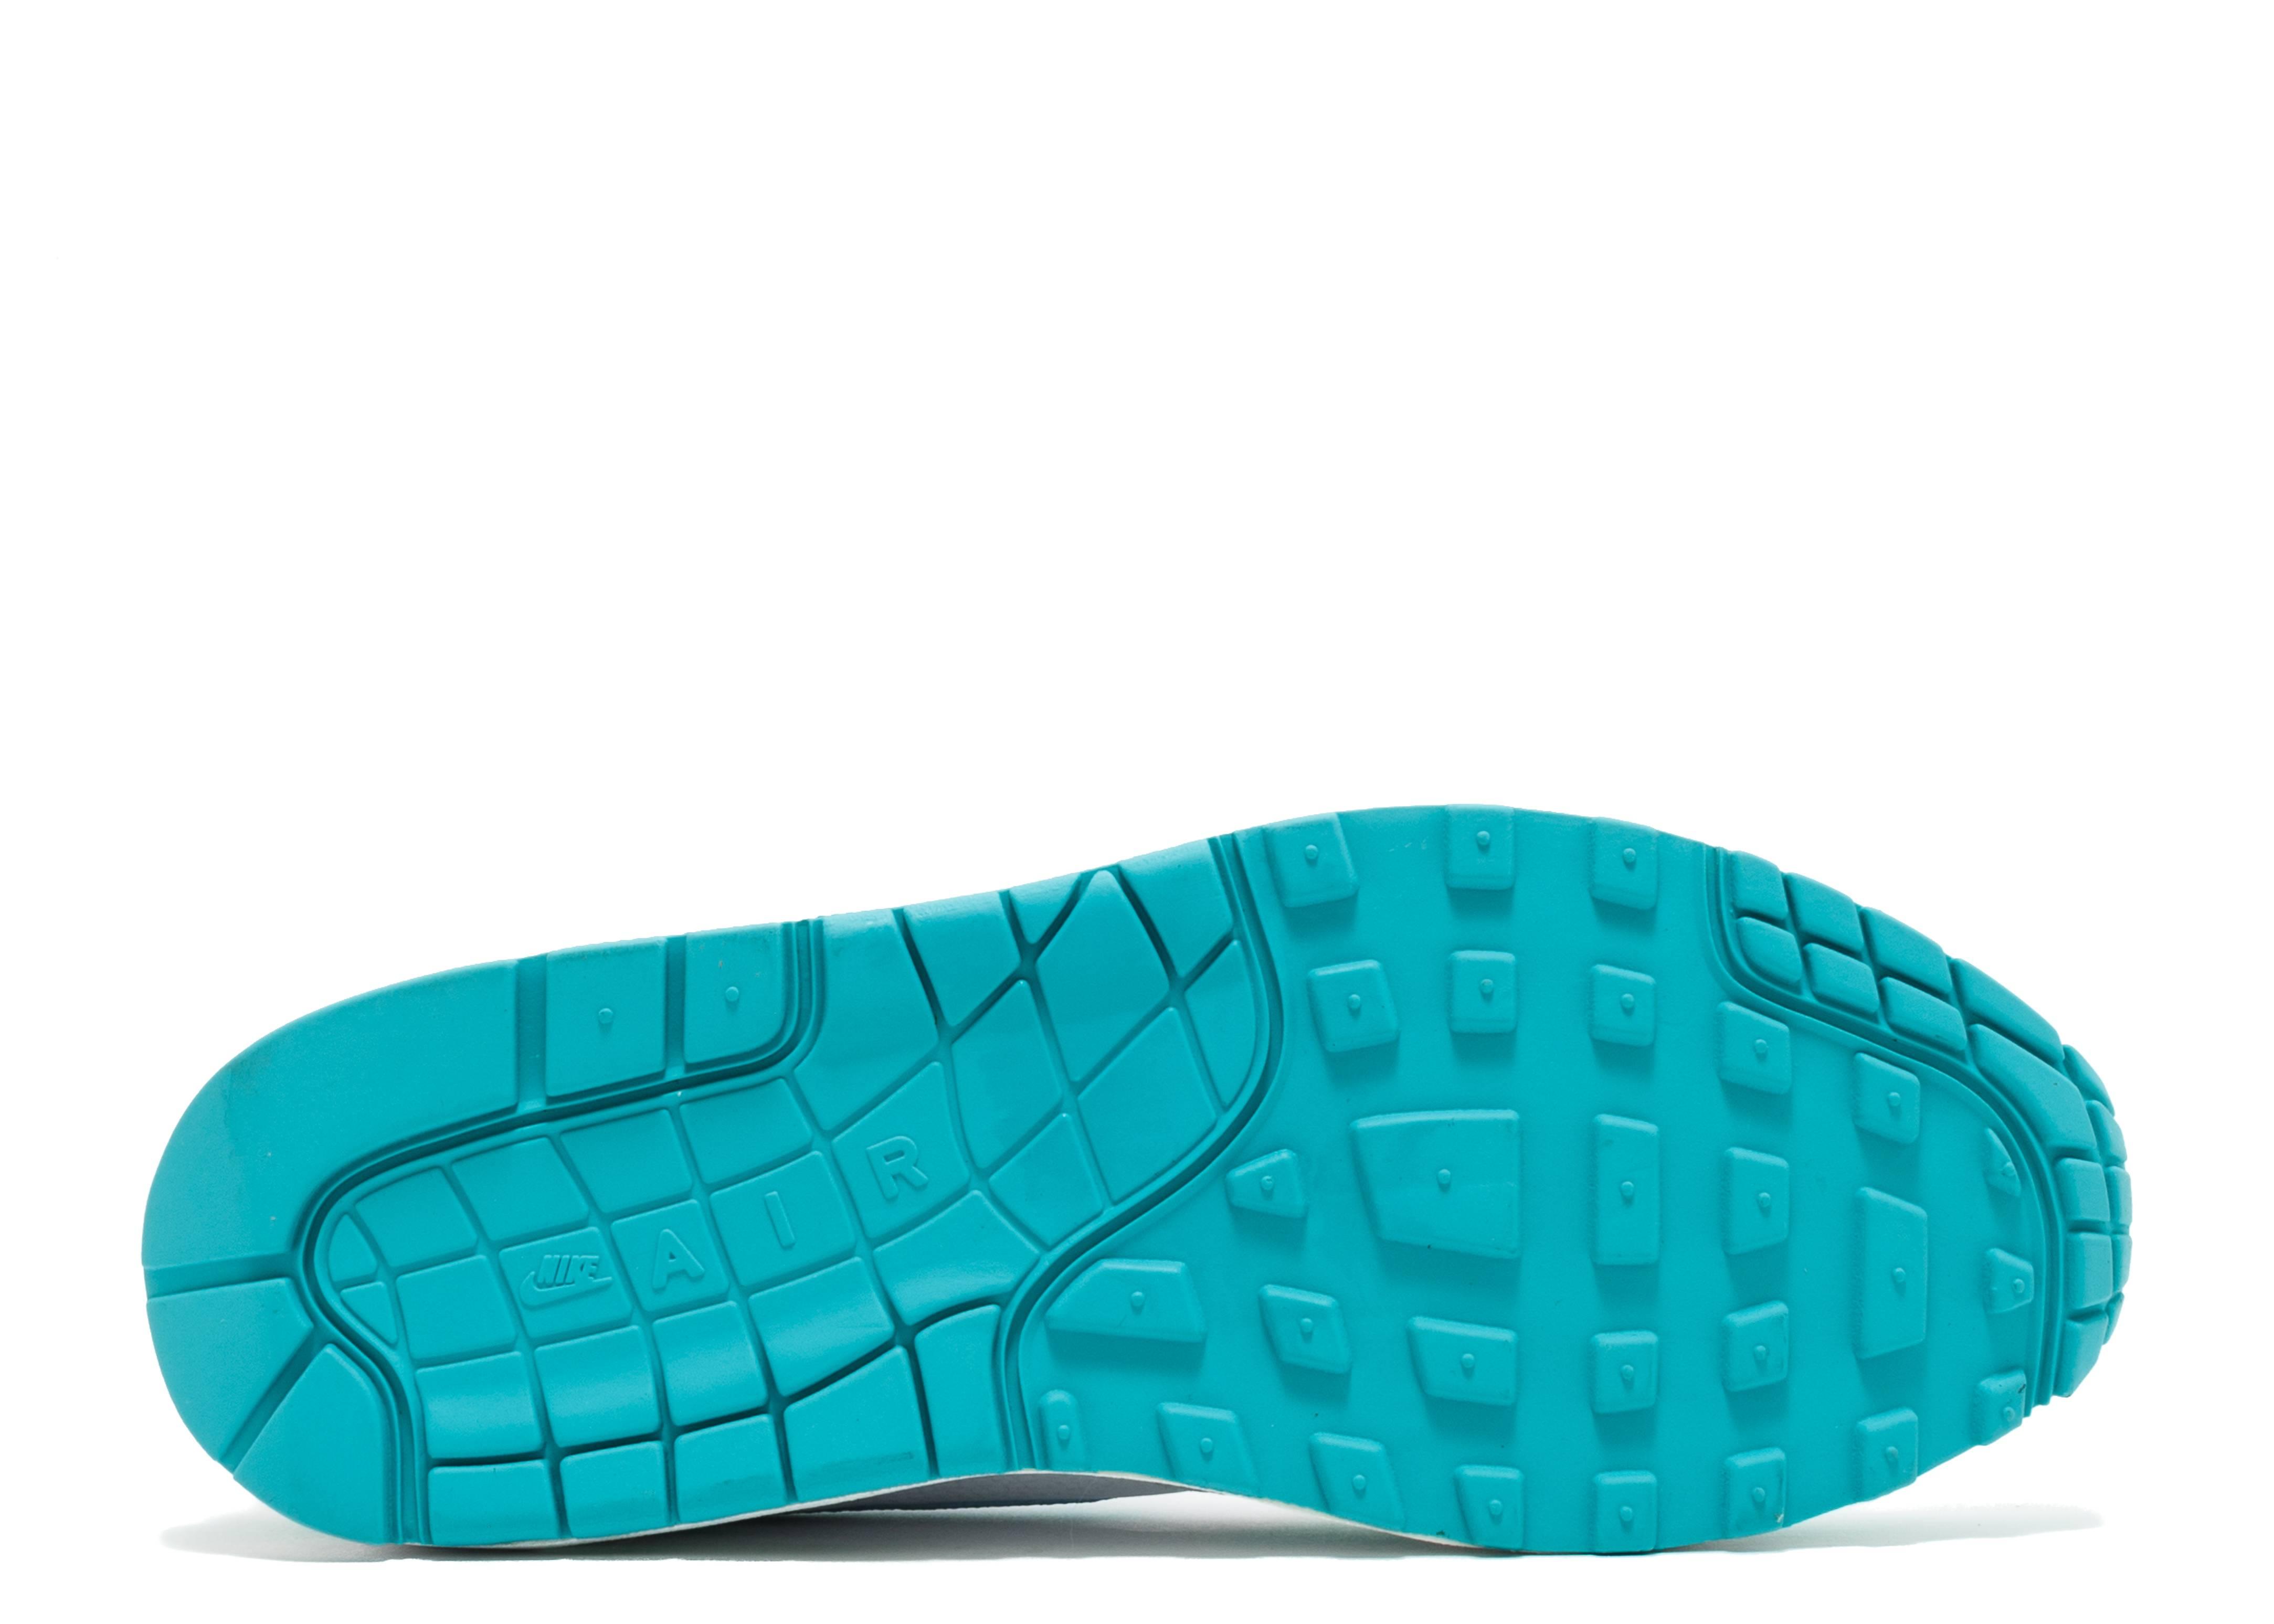 new styles 42707 709c9 Wmns Air Max 1 Essential - Nike - 599820 113 - white artisan teal-lt retro    Flight Club